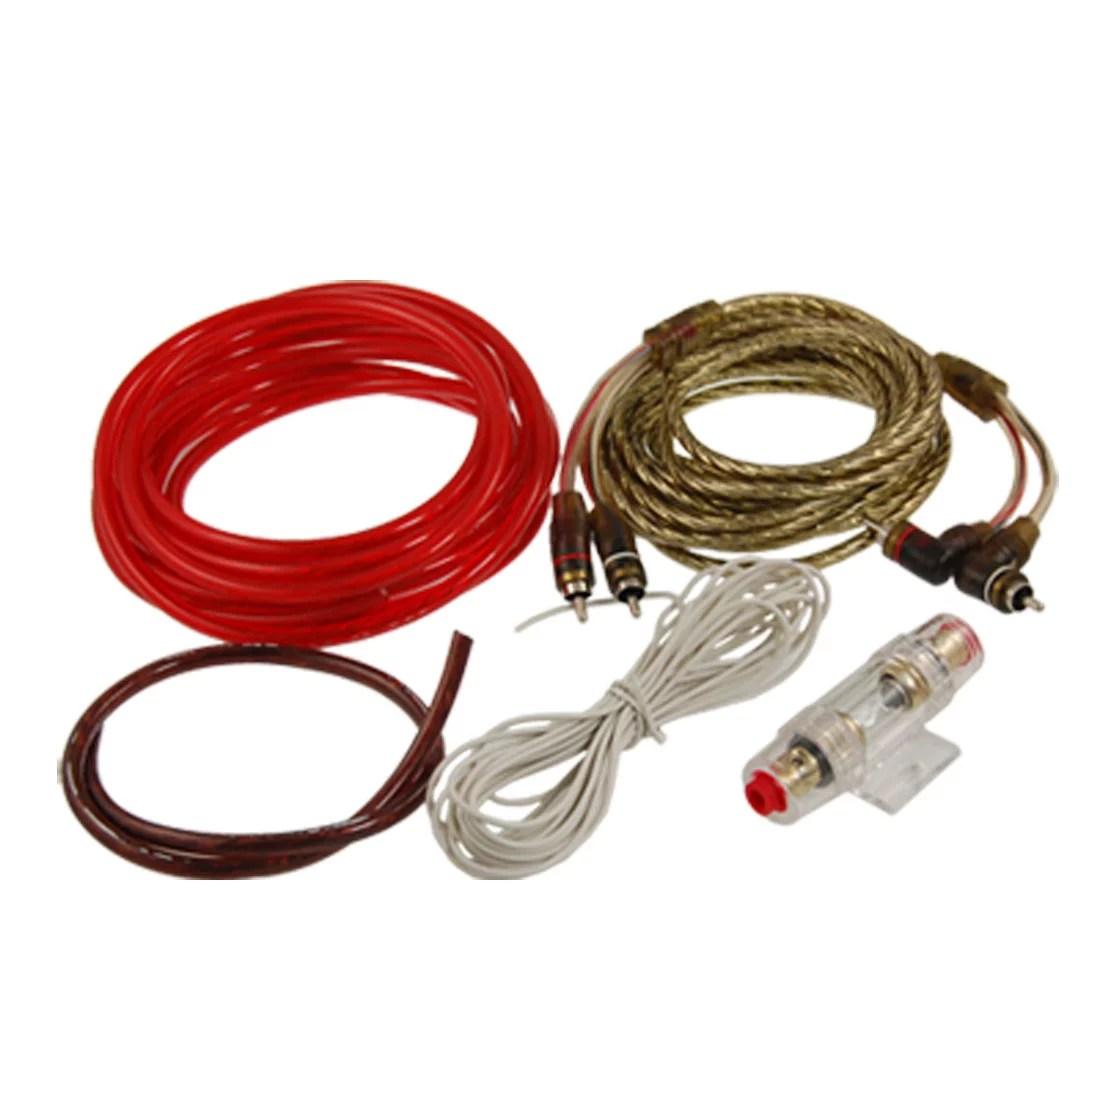 medium resolution of car audio 4 pcs cables fuse holder amplifier wiring kit walmart com audio amplifier kit car audio wiring kit walmart